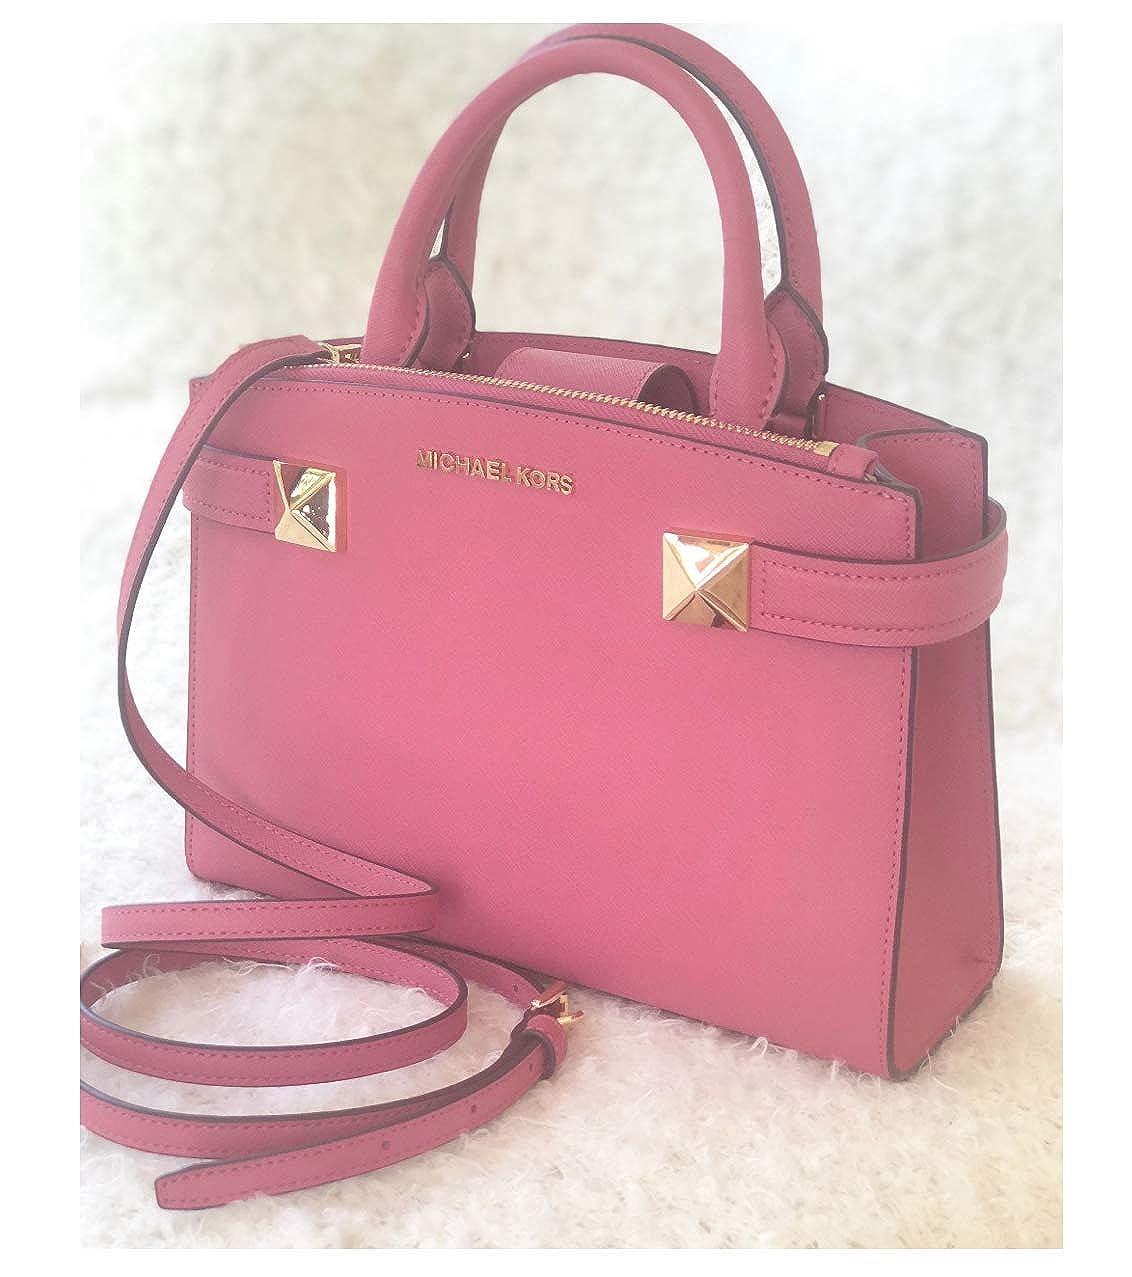 1b650e55de3b Michael Kors Karla SM Satchel Leather Black (35T8MKGS1L)  Handbags   Amazon.com